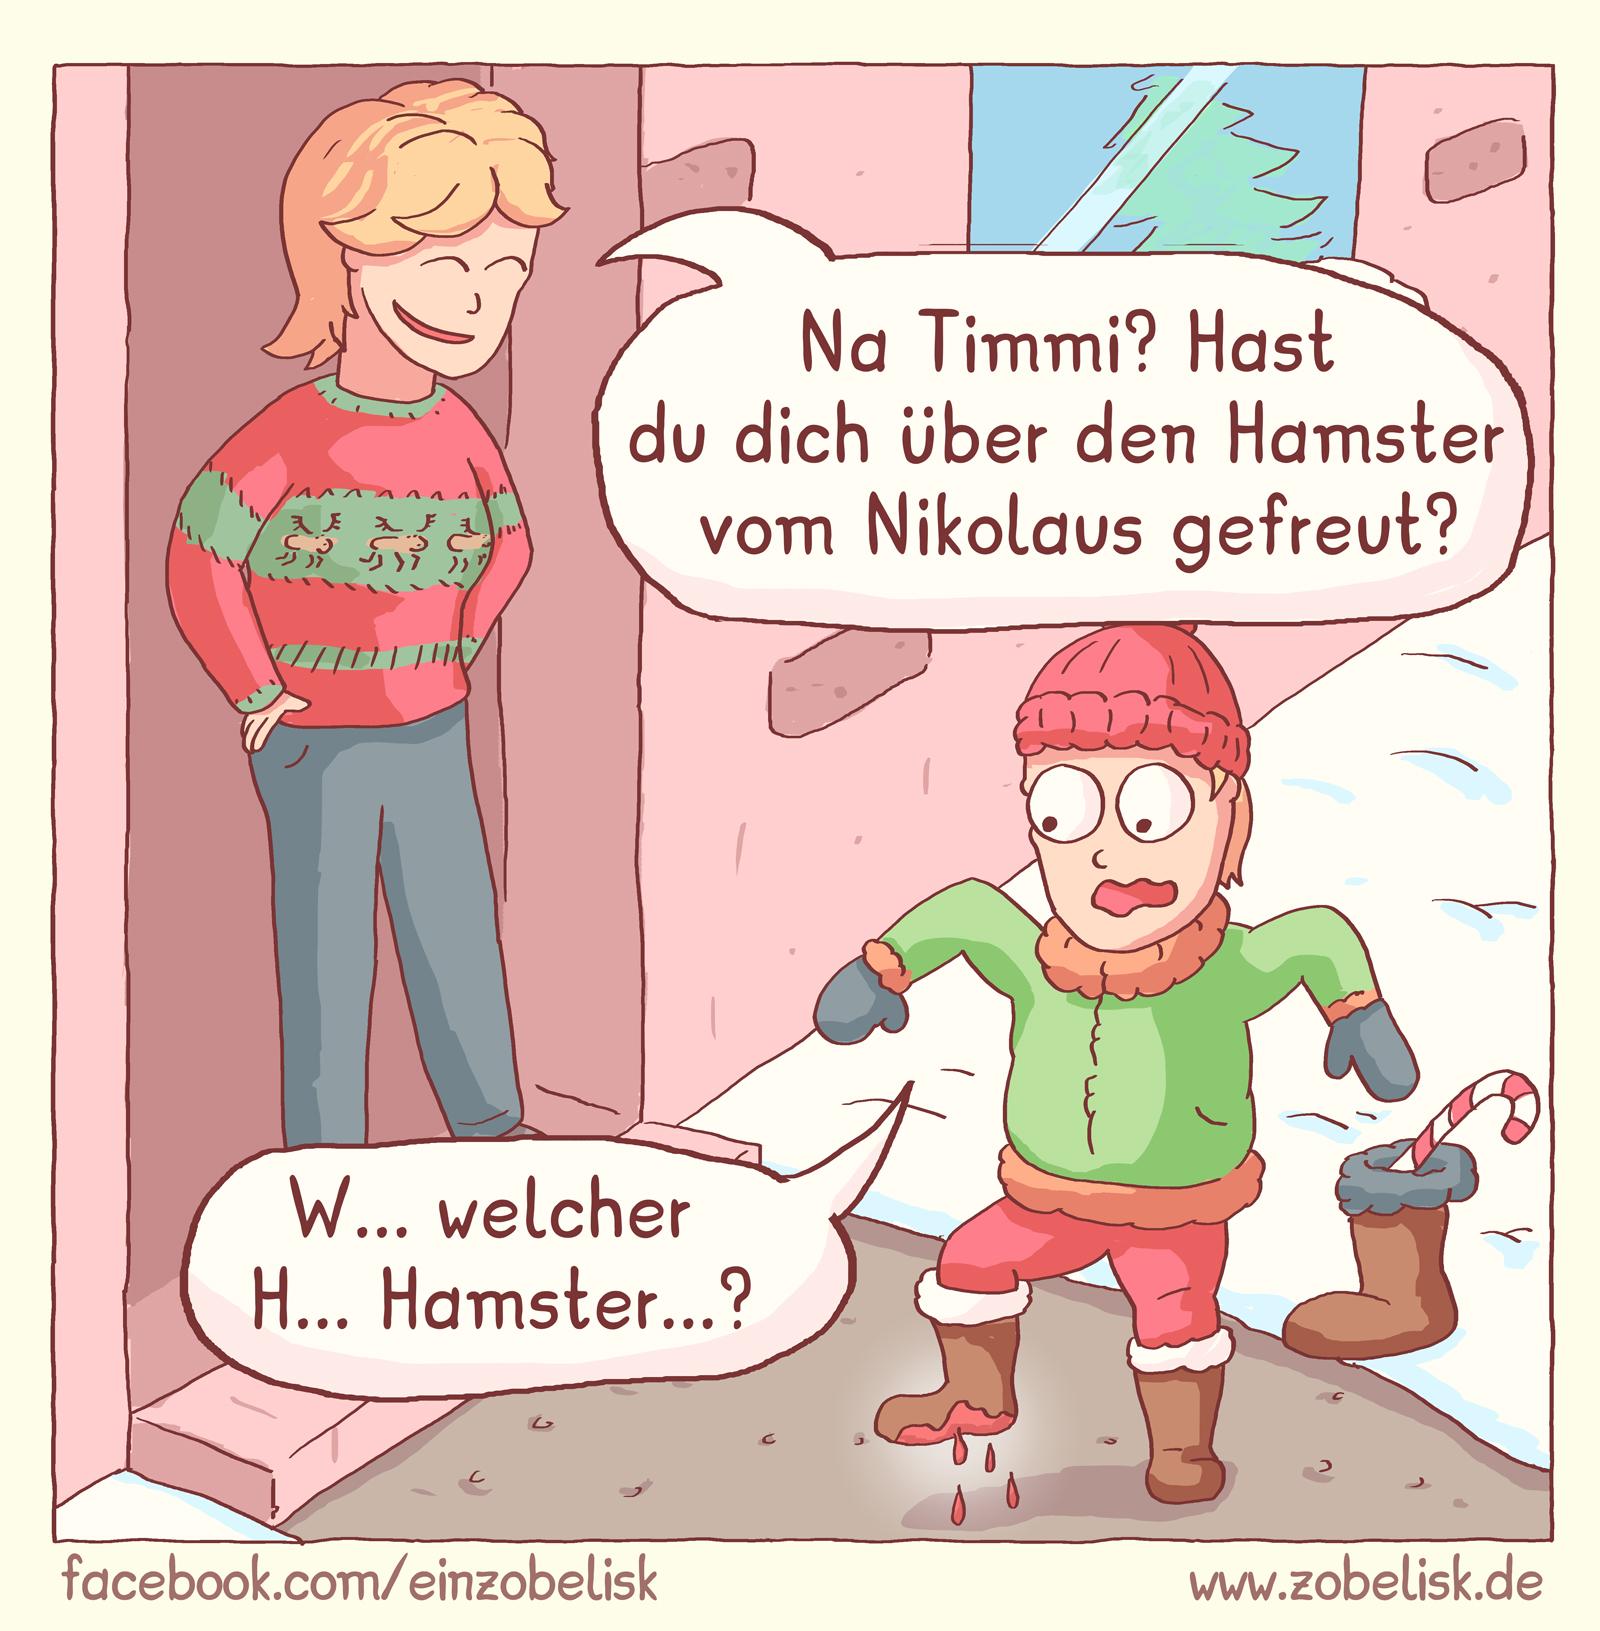 nikolaus-comic